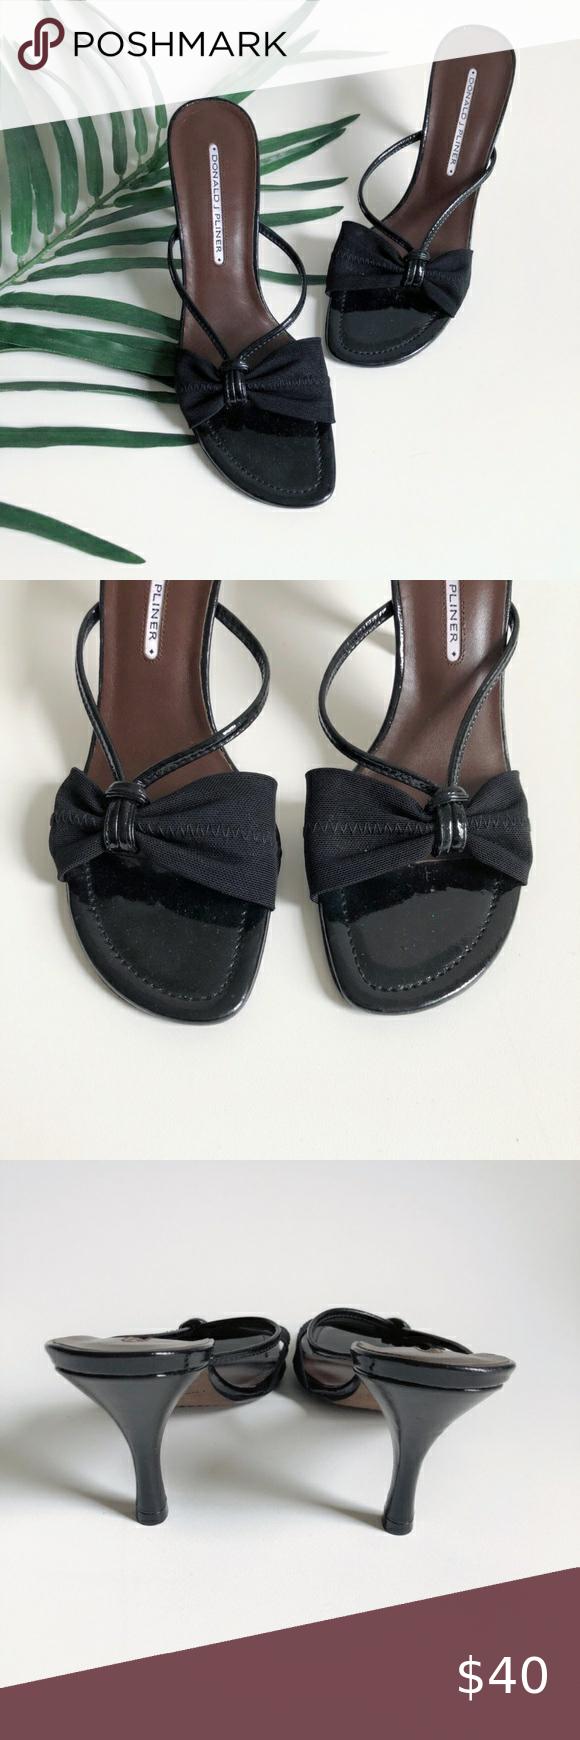 Donald J Pliner Fabric Strap Kitten Heel Sandals In 2020 Kitten Heel Sandals Shoes Women Heels Sandals Heels